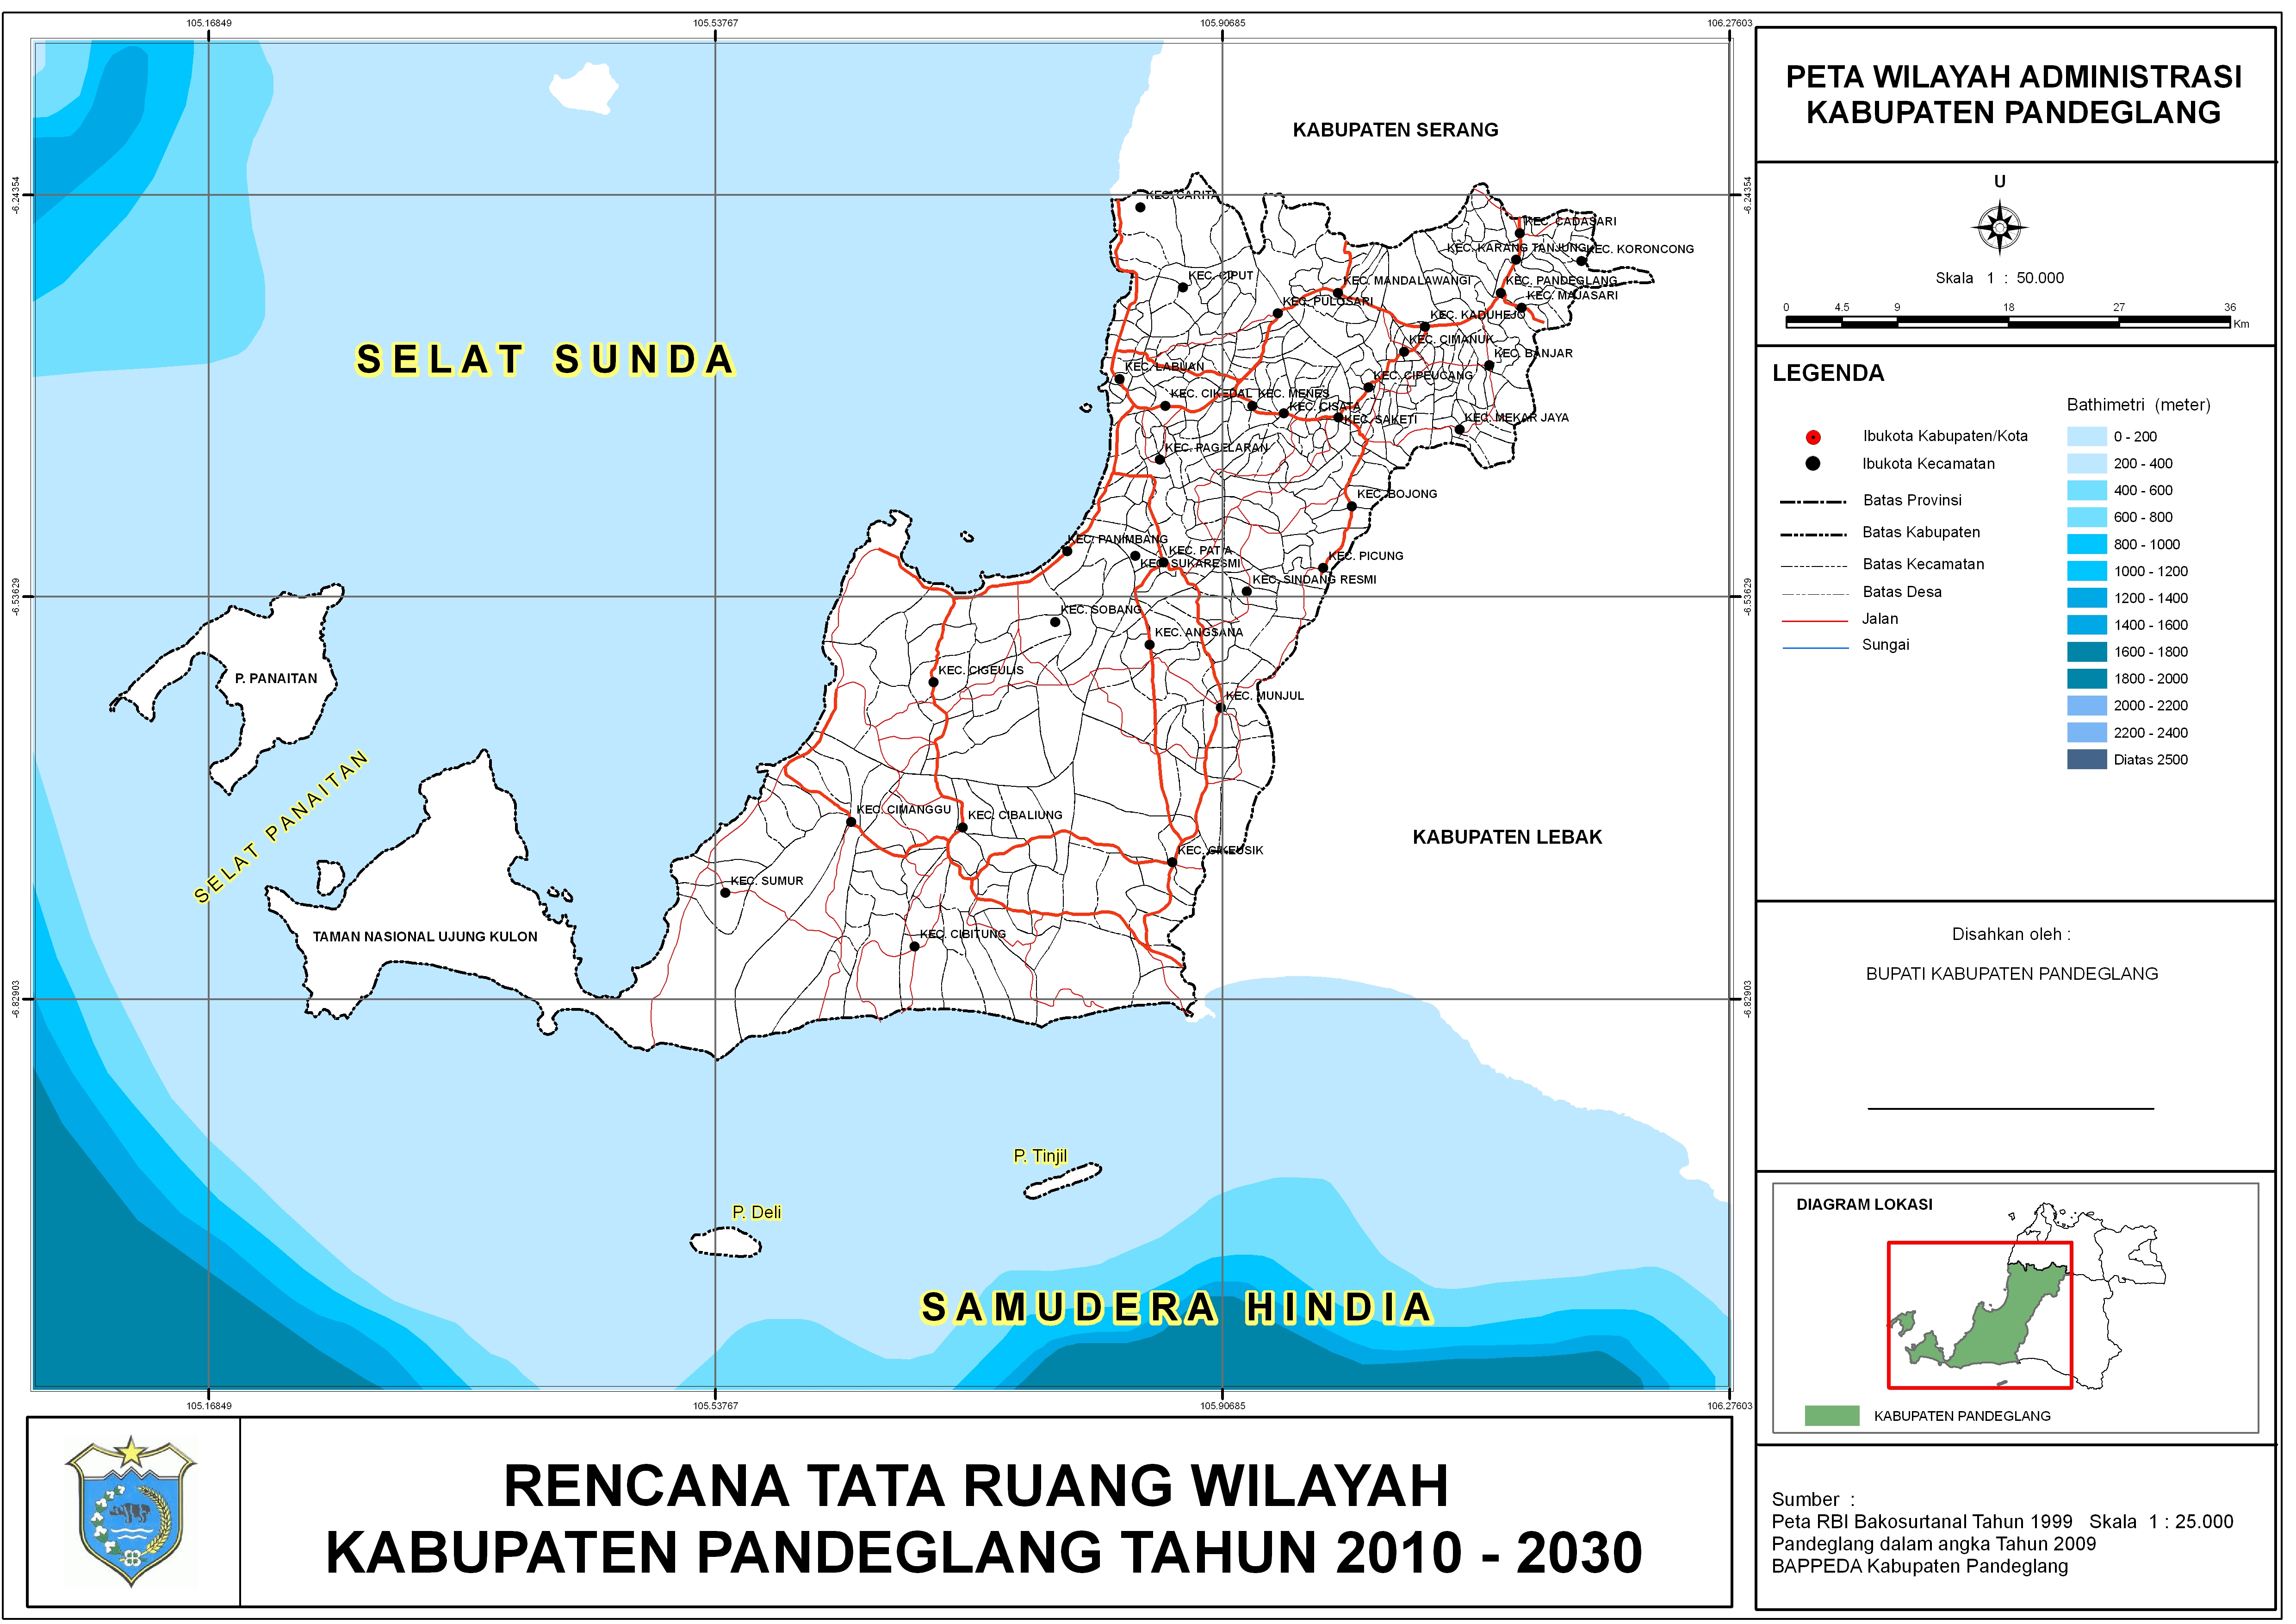 Profil Kabupaten Pandeglang Peta Administrasi Kab Pulau Panaitan